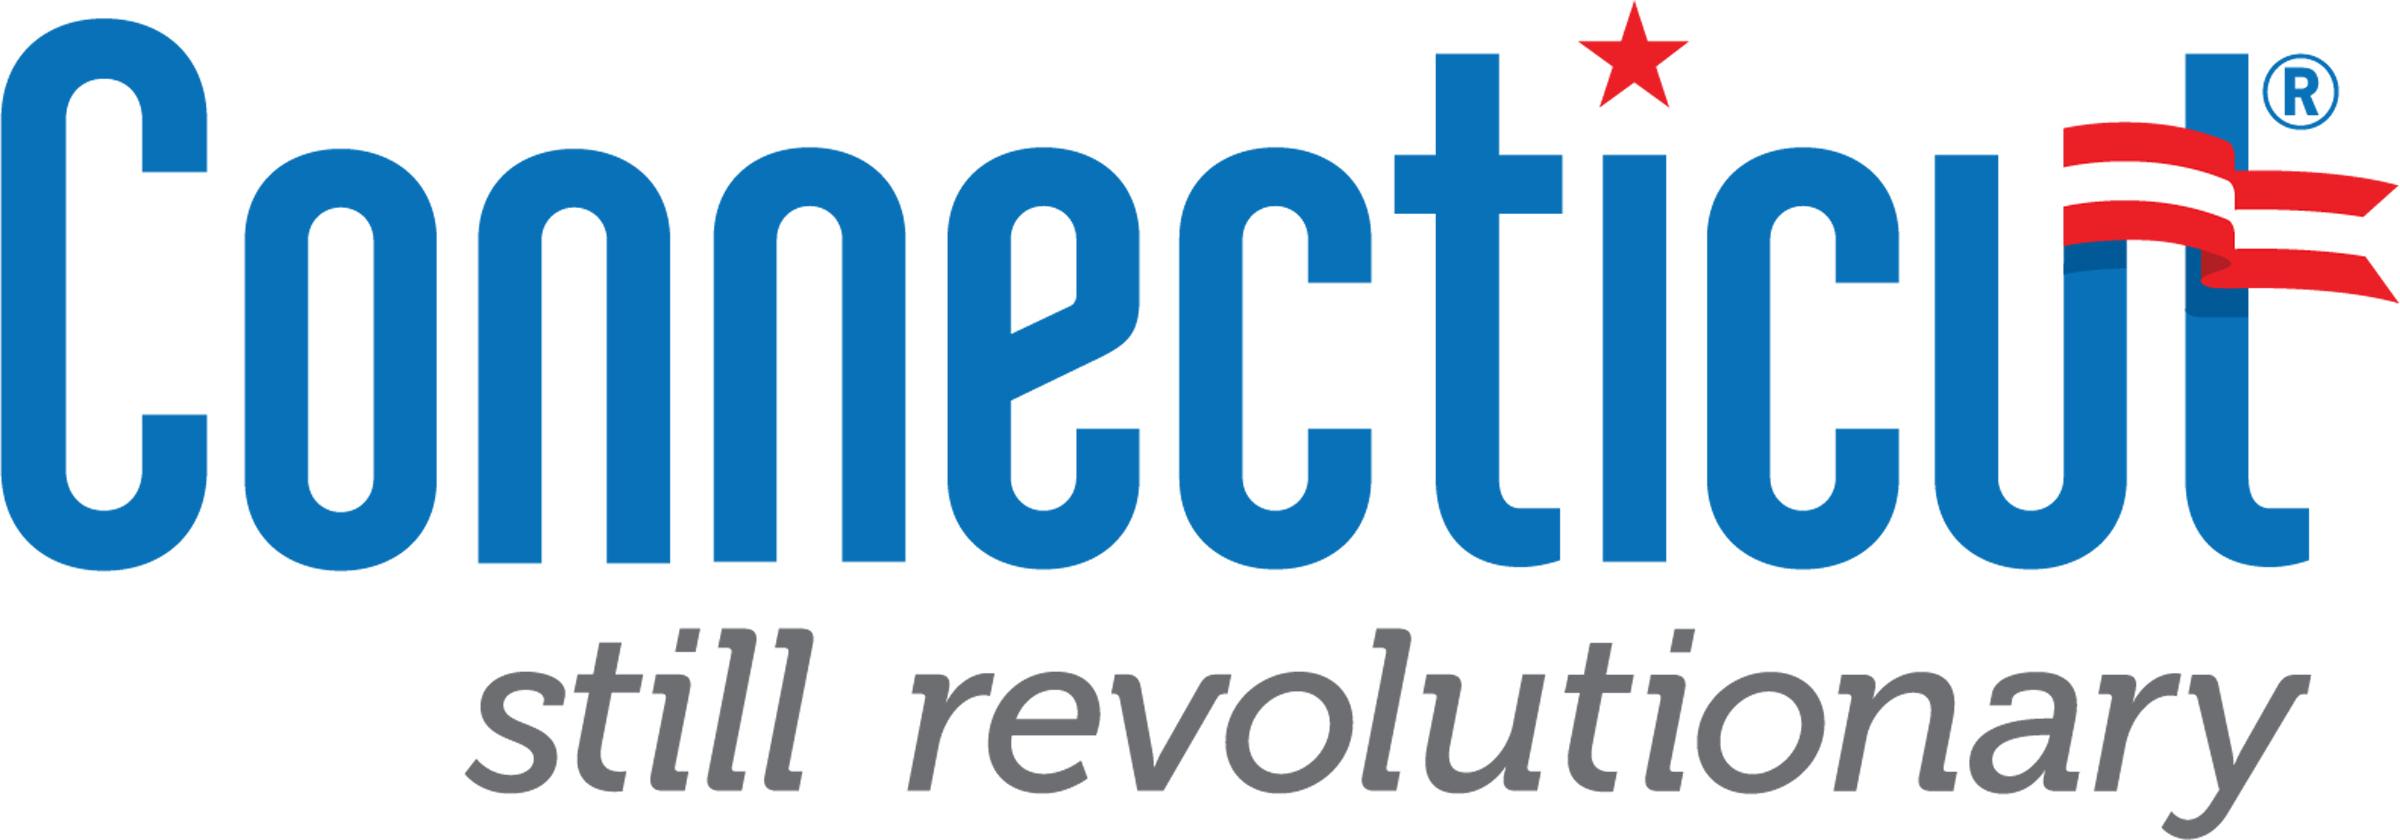 DECD Logo.jpg